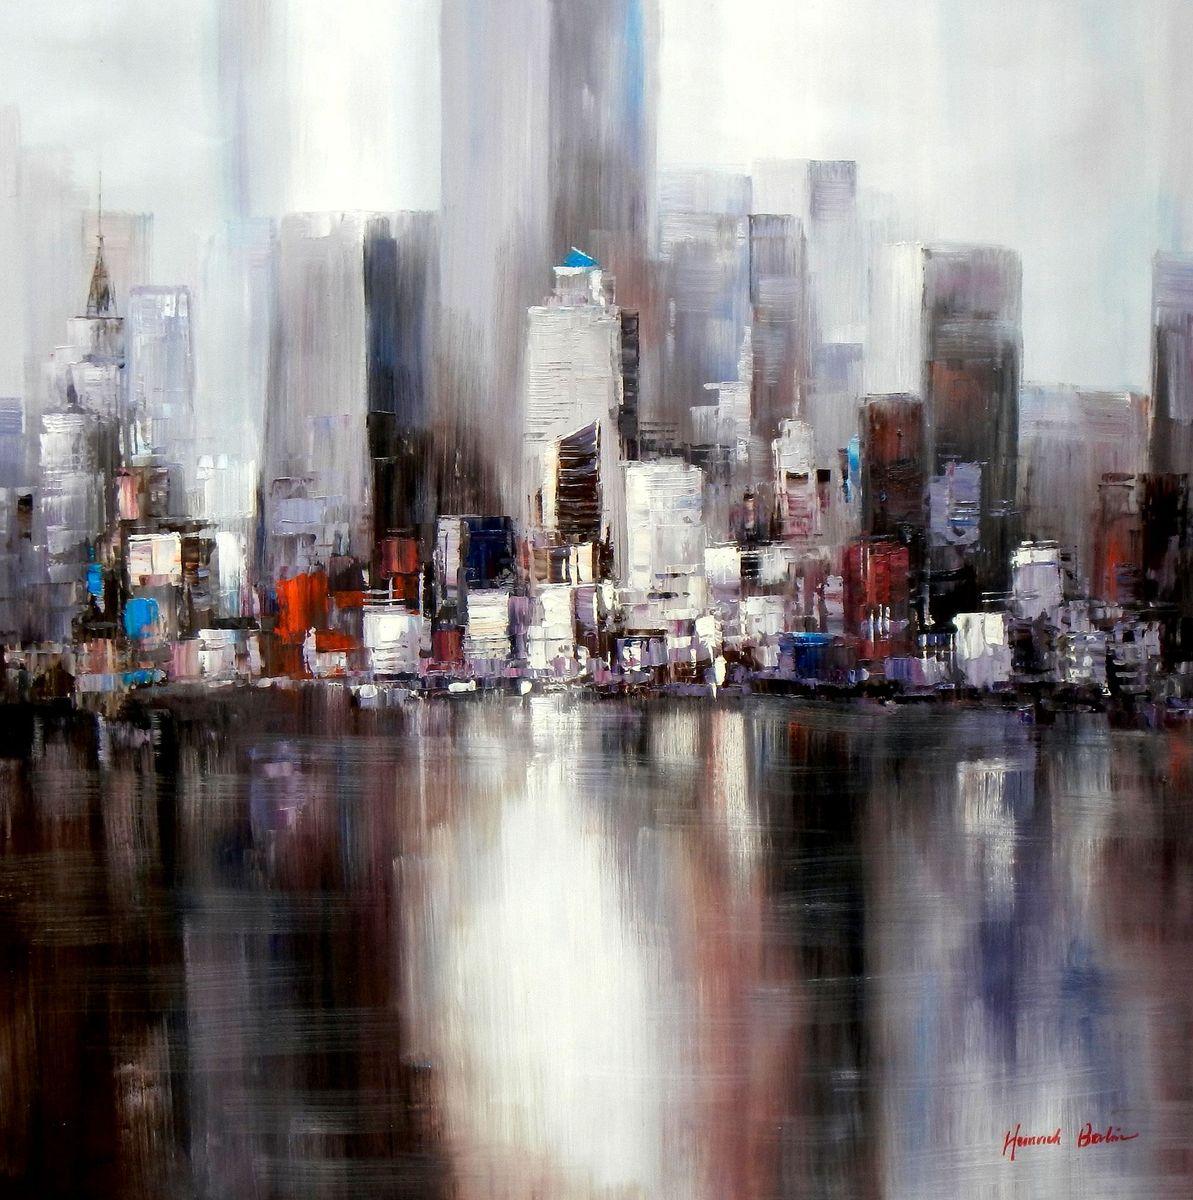 Abstrakt New York Manhattan Skyline im Morgengrau m93554 120x120cm abstraktes Ölbild Museumsqualität